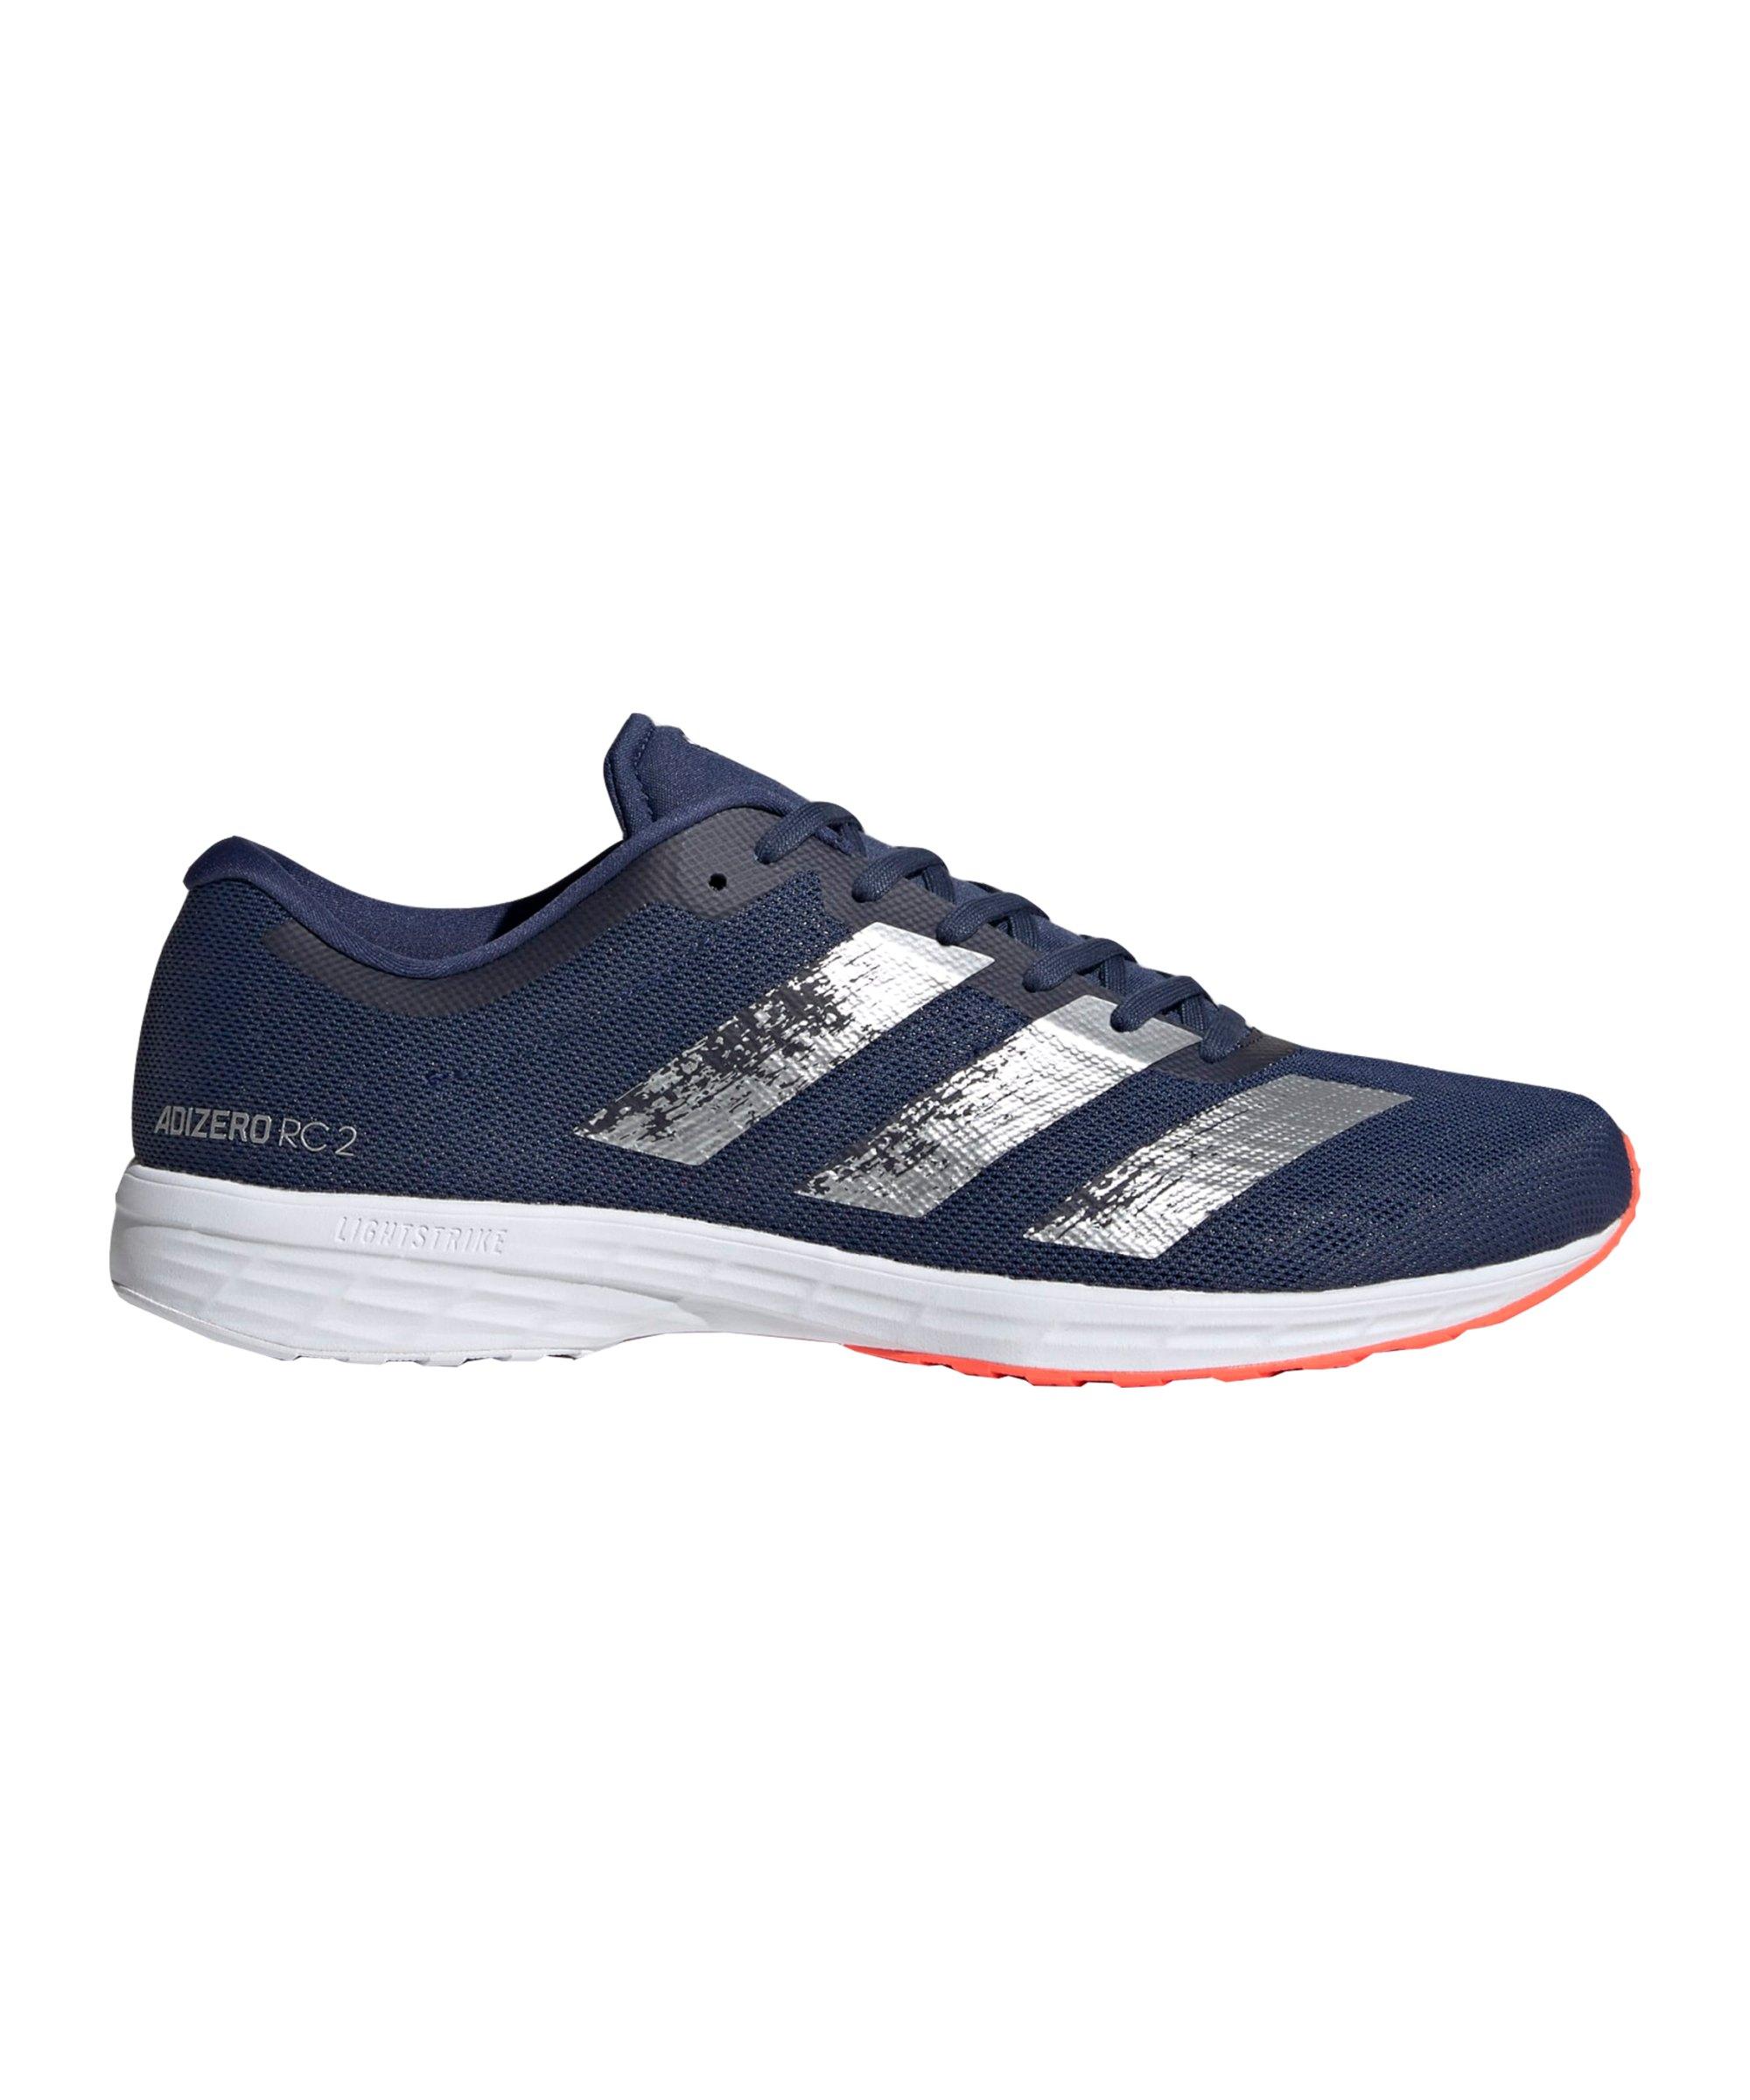 adidas Adizero RC 2 m Running Blau Rot - blau